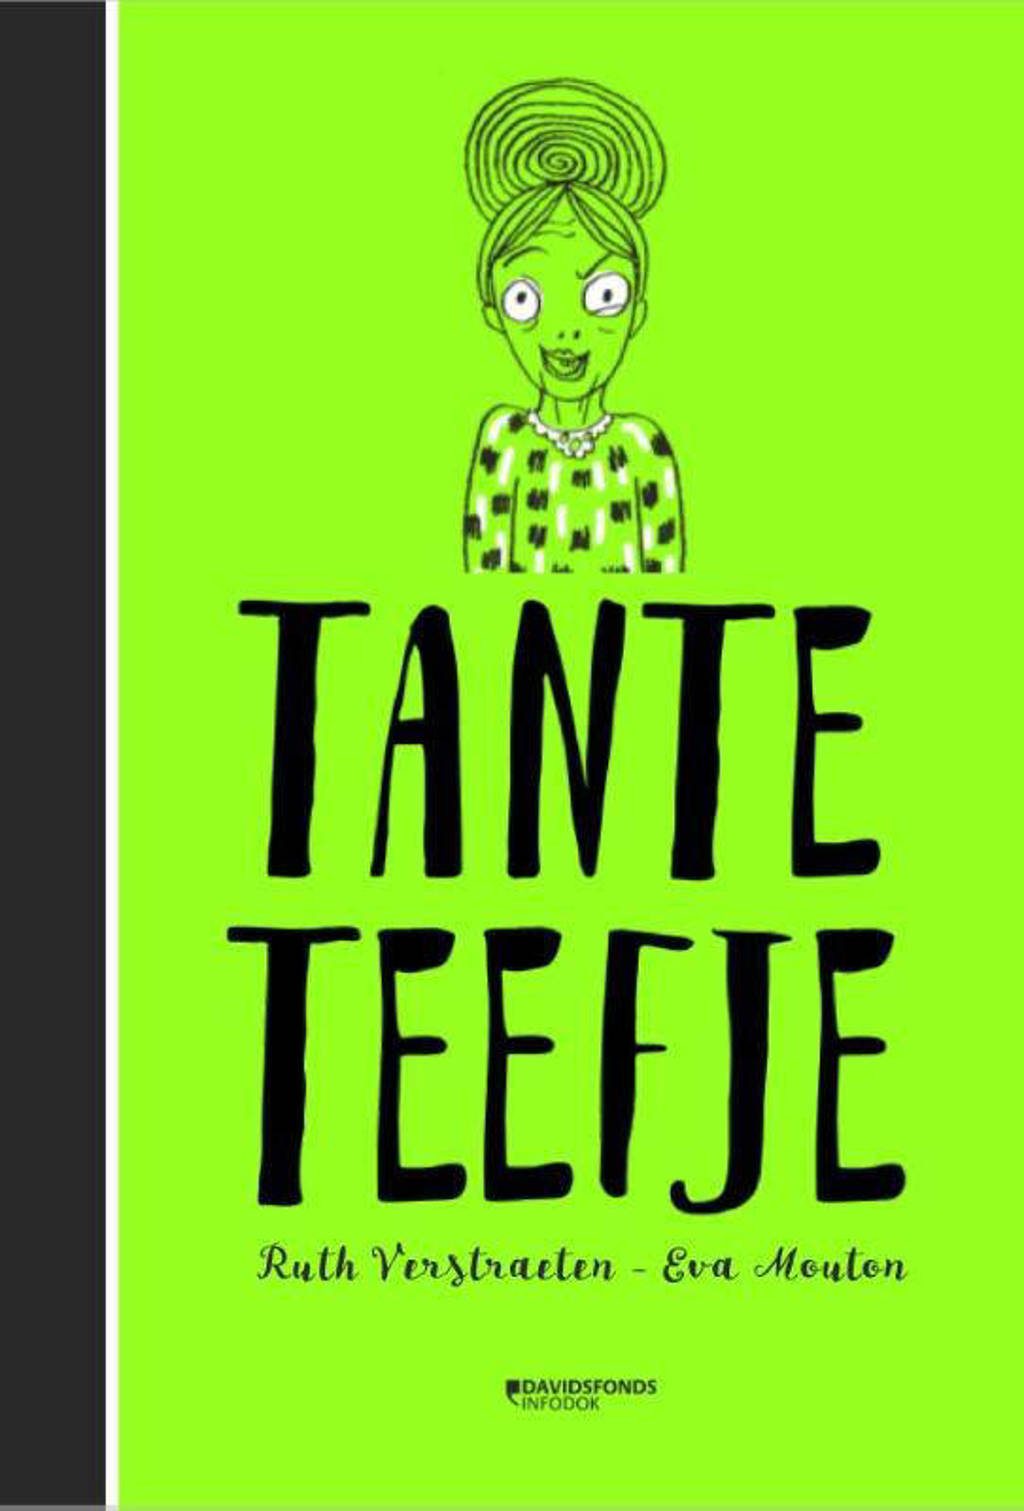 Tante Teefje - Ruth Verstraeten en Eva Mouton